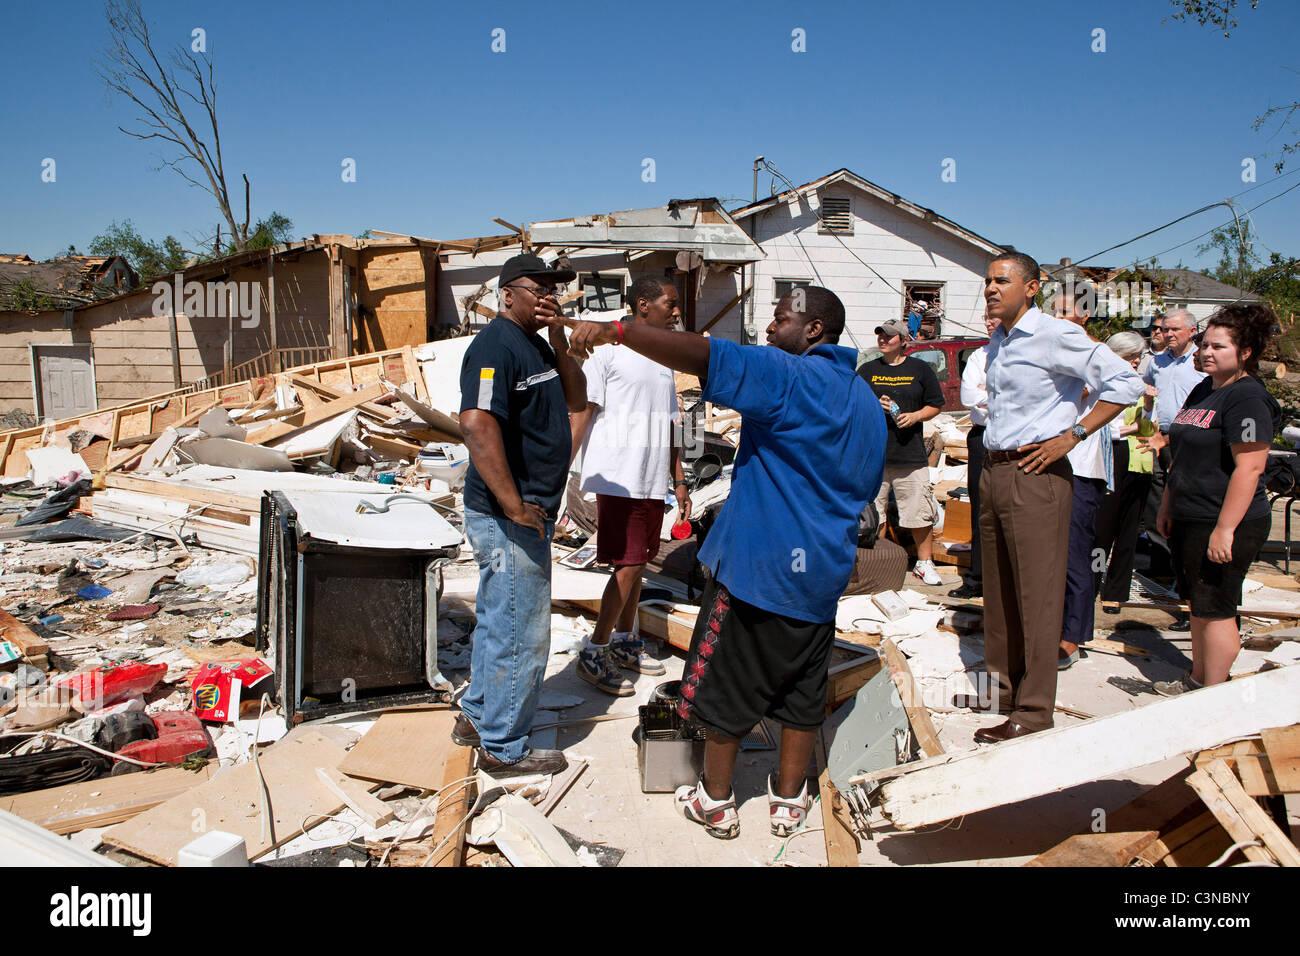 President Barack Obama and First Lady Michelle Obama inspect tornado damage in Tuscaloosa, AL, USA. - Stock Image